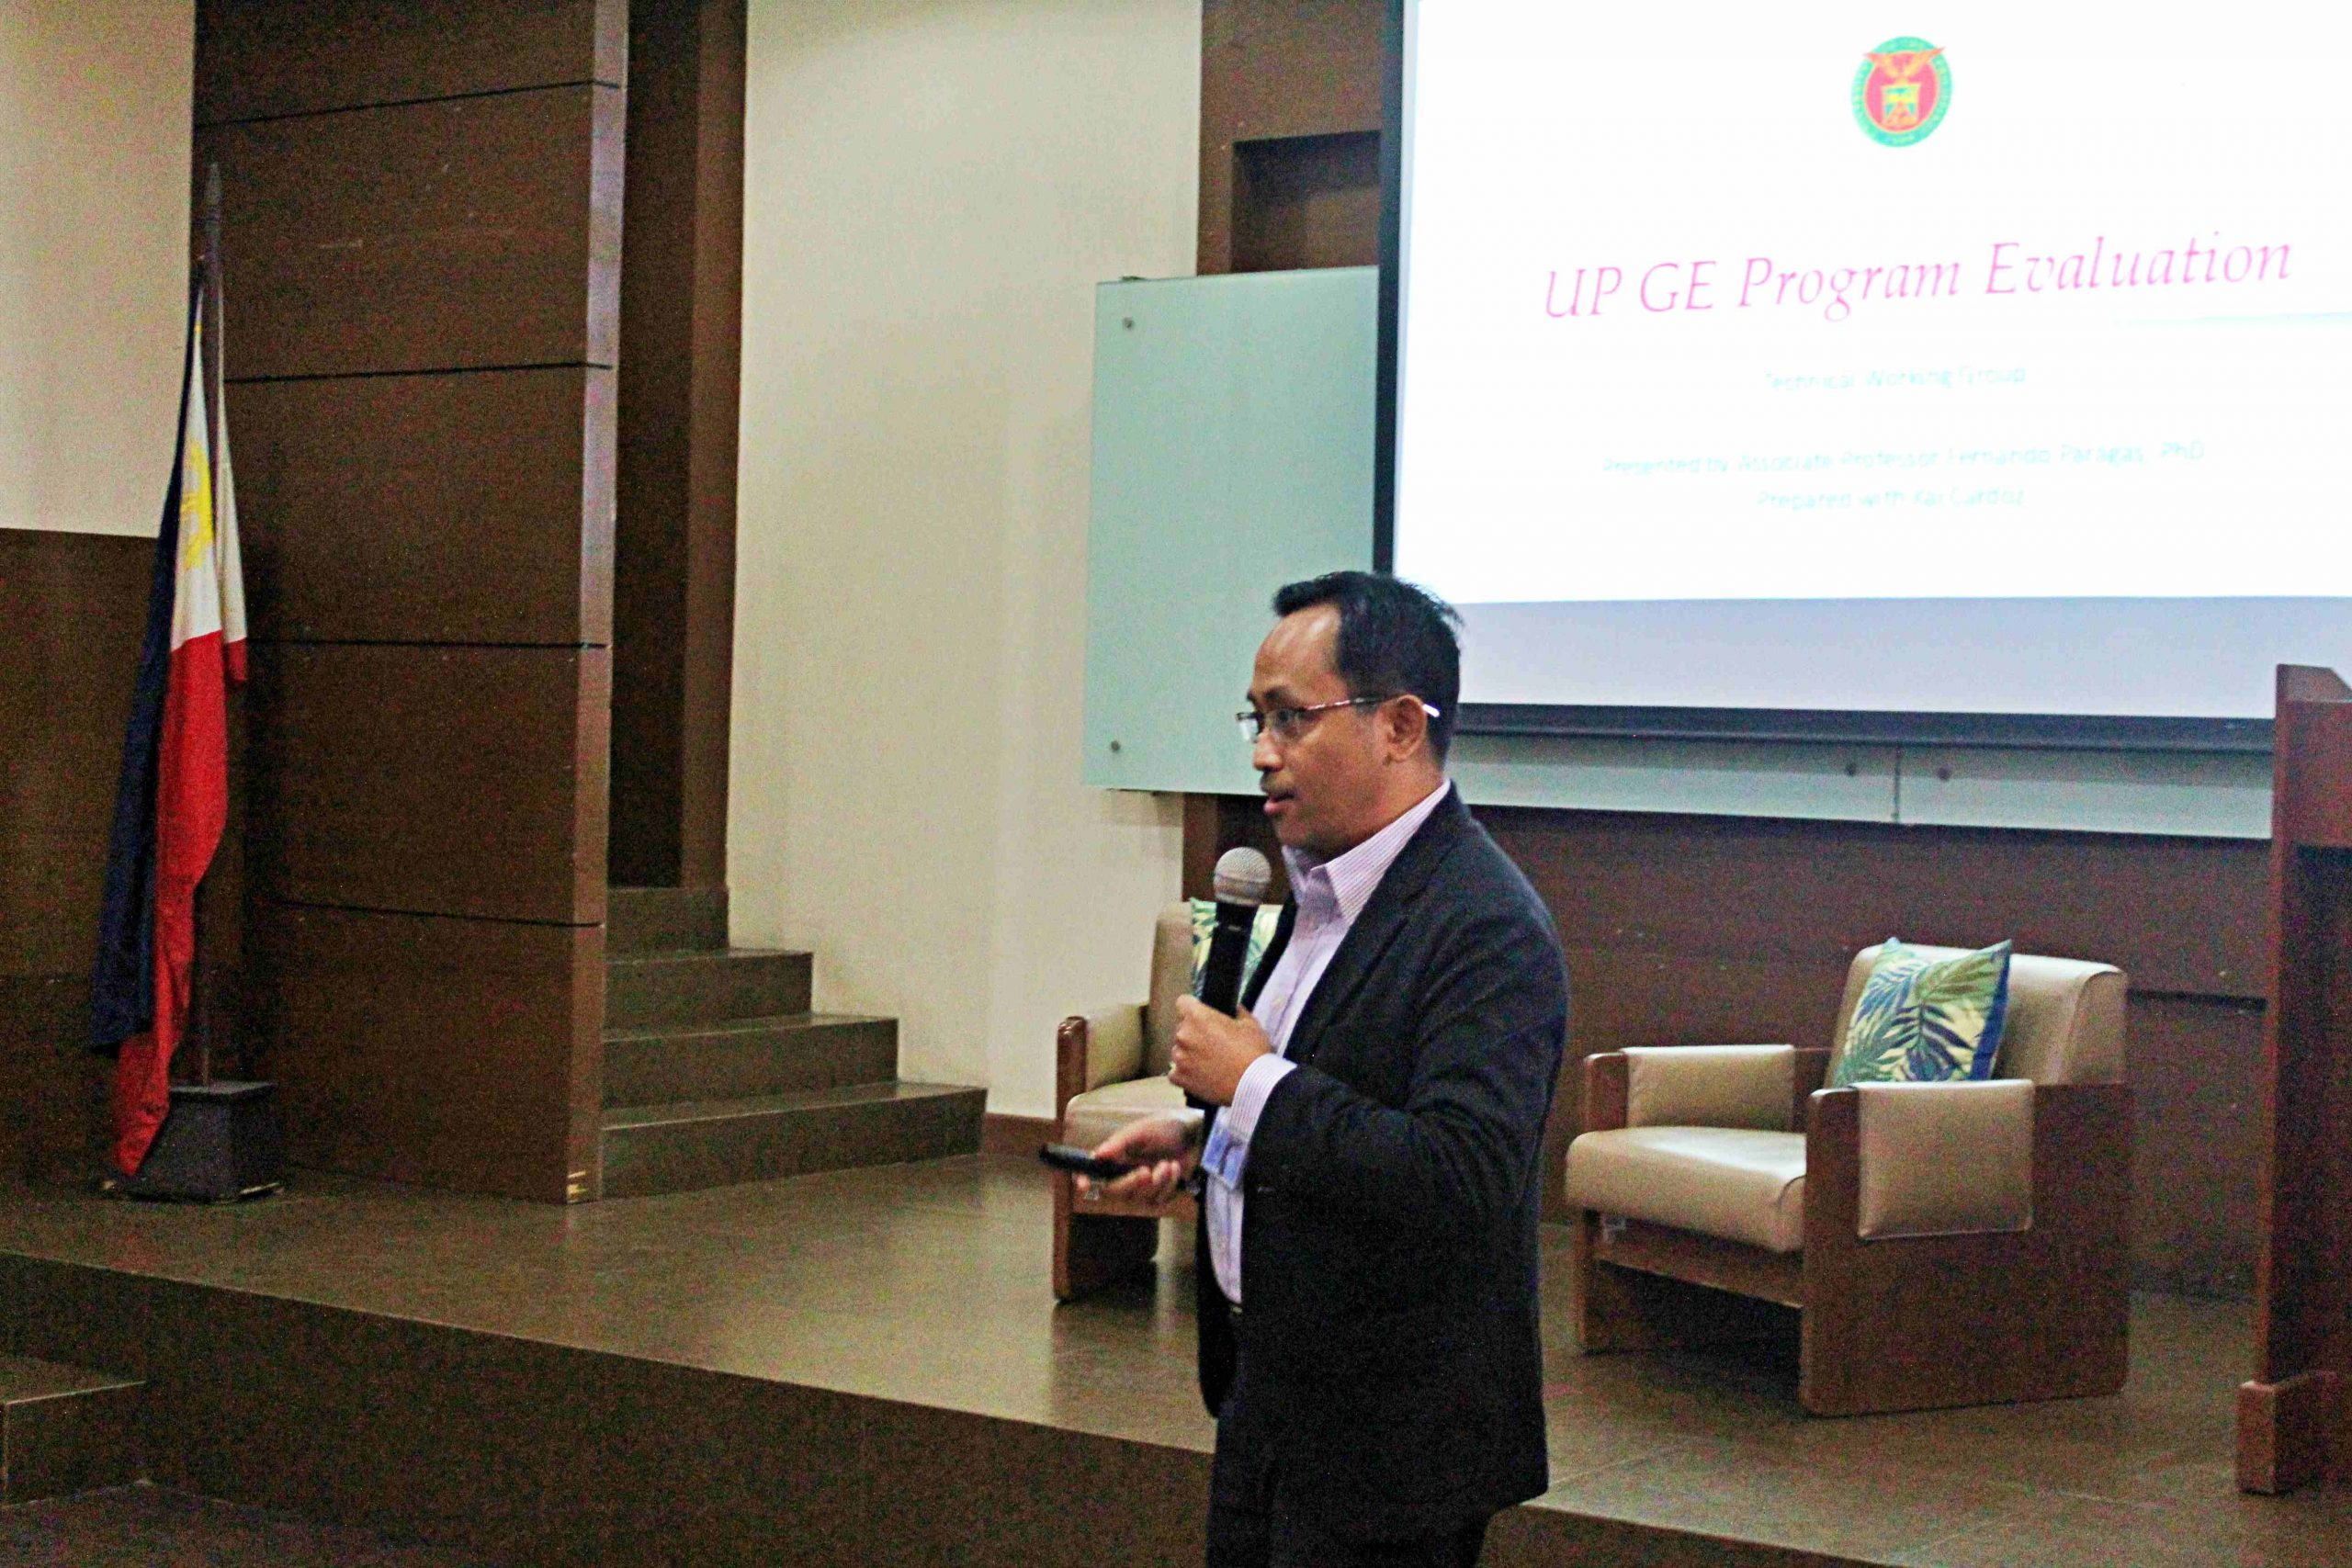 Prof. Paragas shares the Course Exit Survey